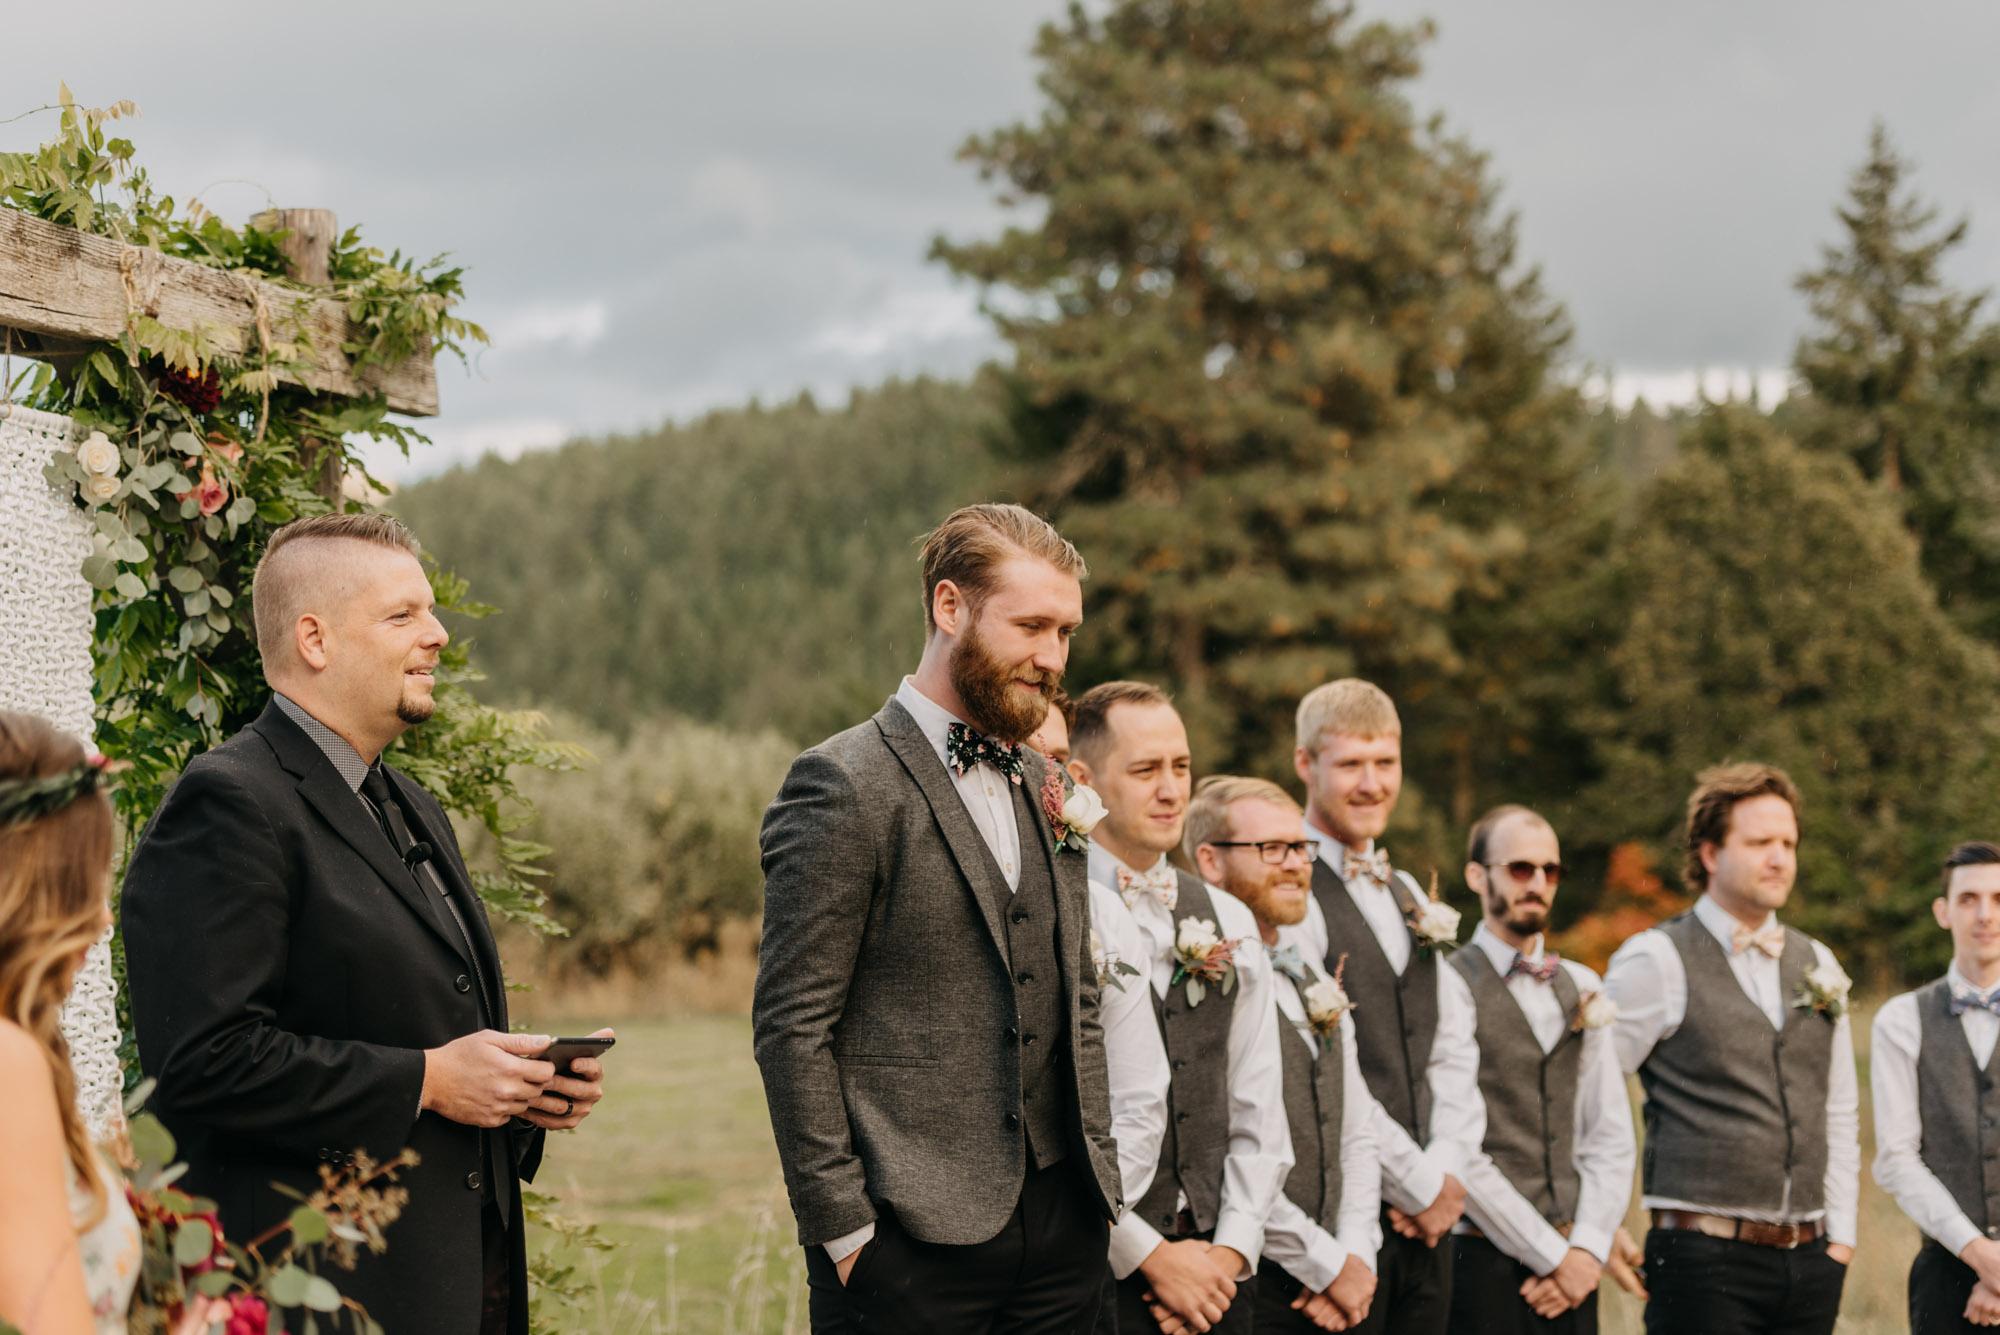 Outdoor-Summer-Ceremony-Washington-Wedding-Rainbow-8929.jpg